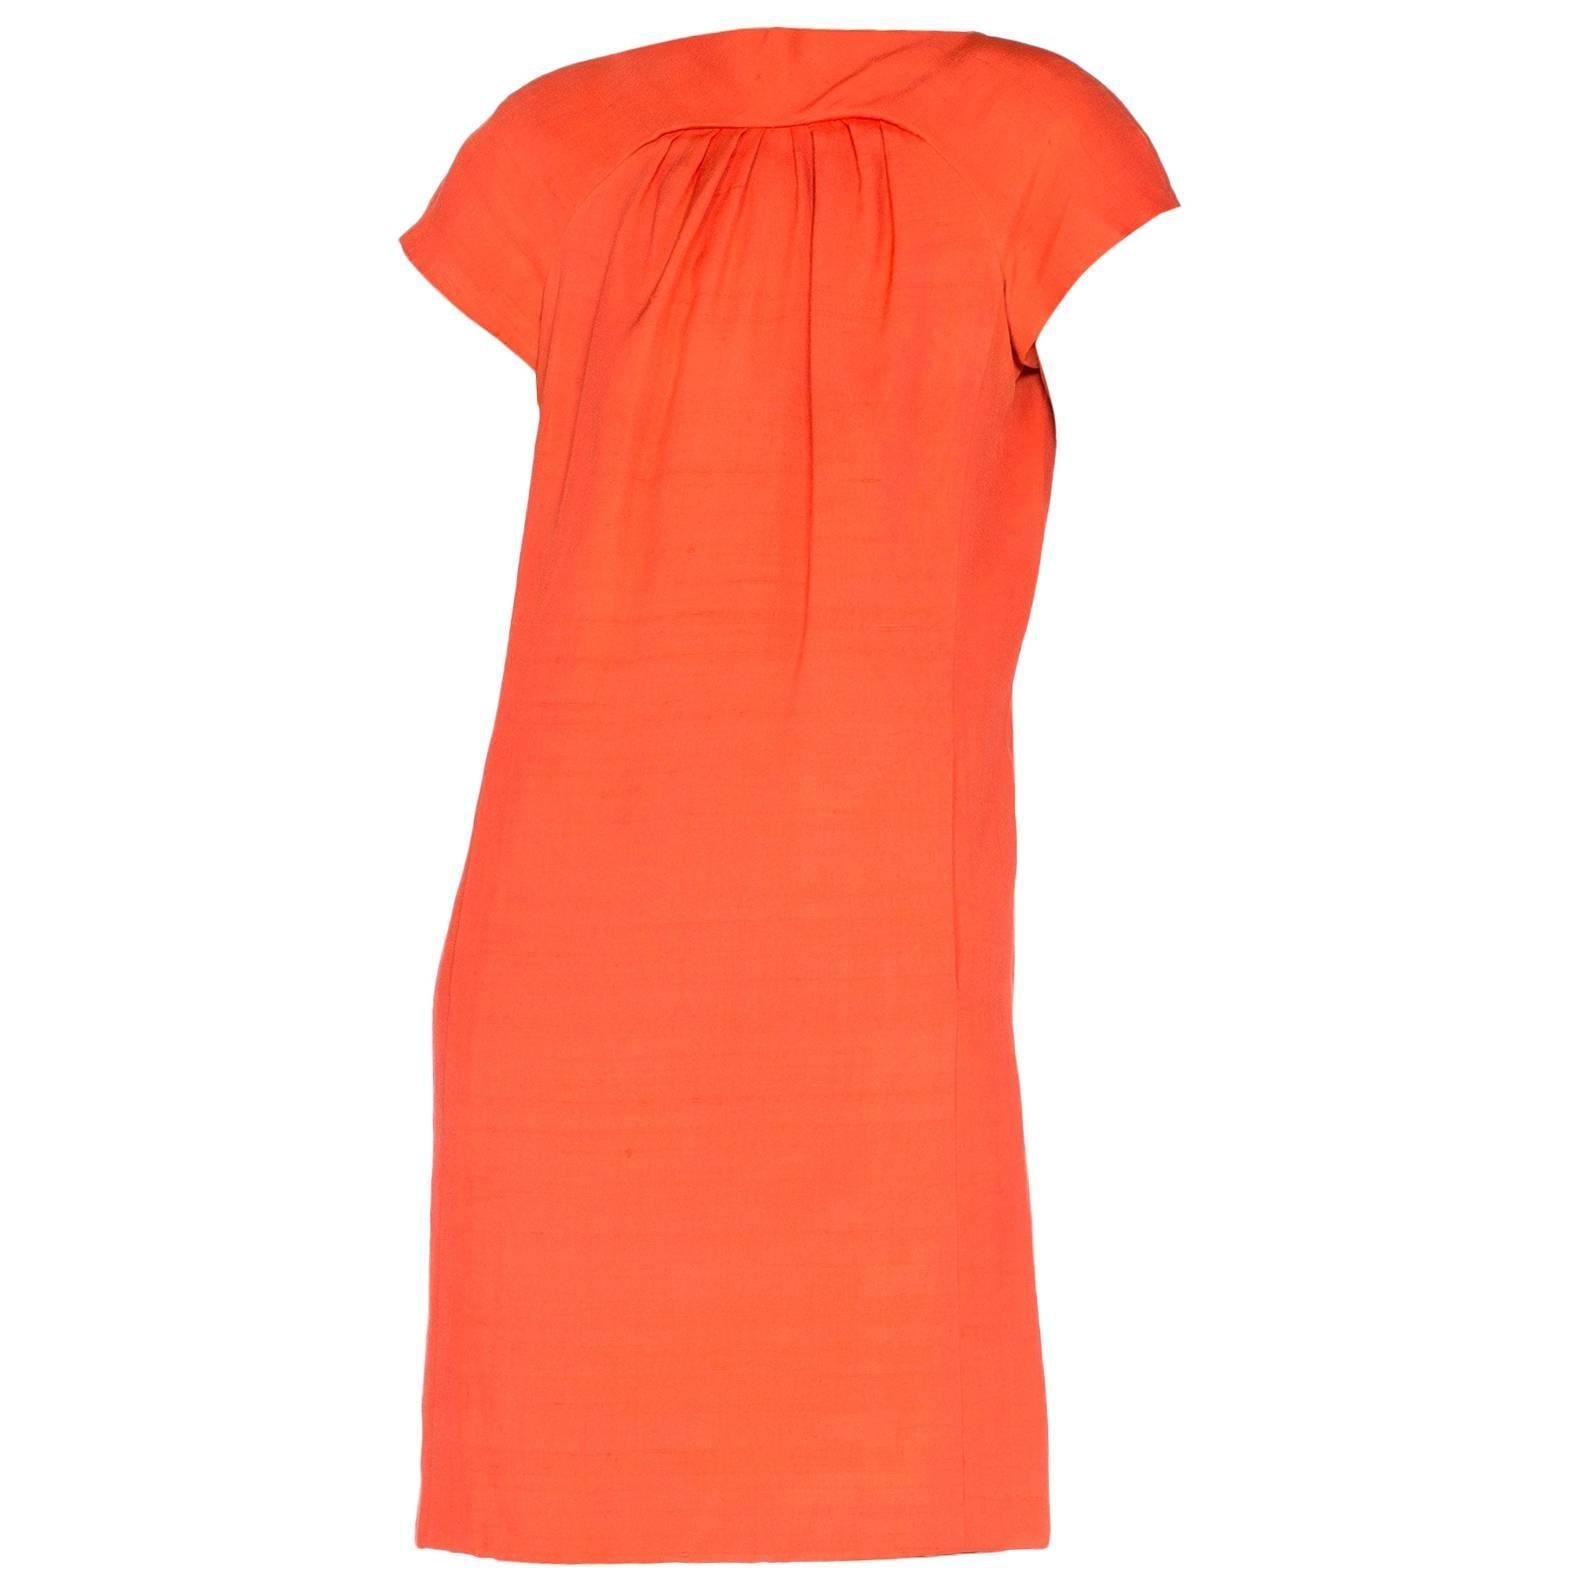 1960S GEOFFREY BEENE Coral Silk Mod Sheath Dress